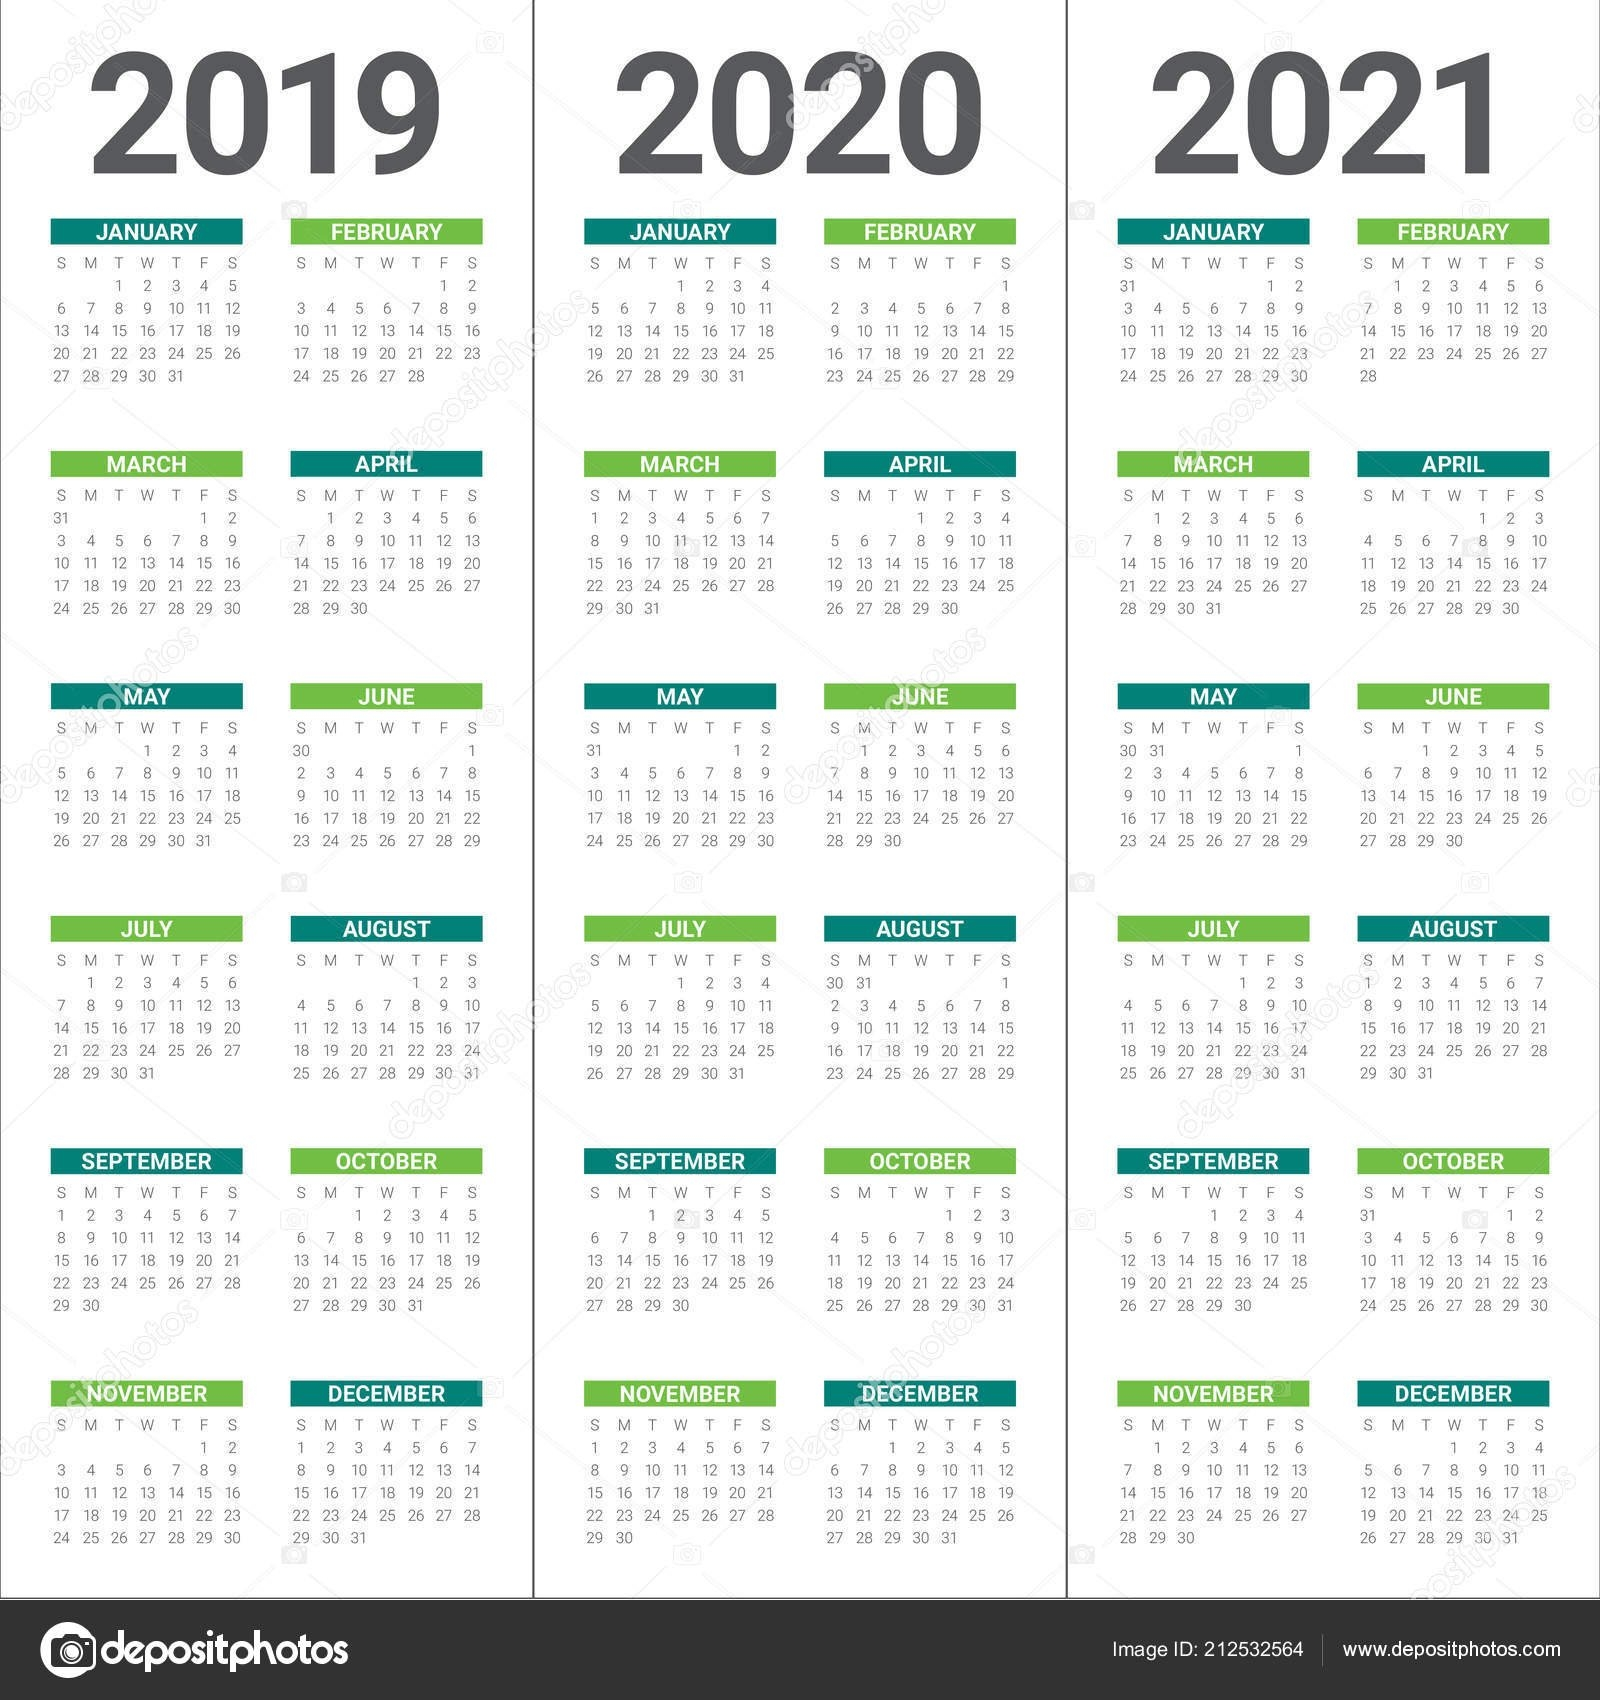 Year 2019 2020 2021 Calendar Vector Design Template Simple Clean — Stock Vector © Dolphfynlow with regard to Three Year Calendar 2019 2021 2021 Calendar Pedia